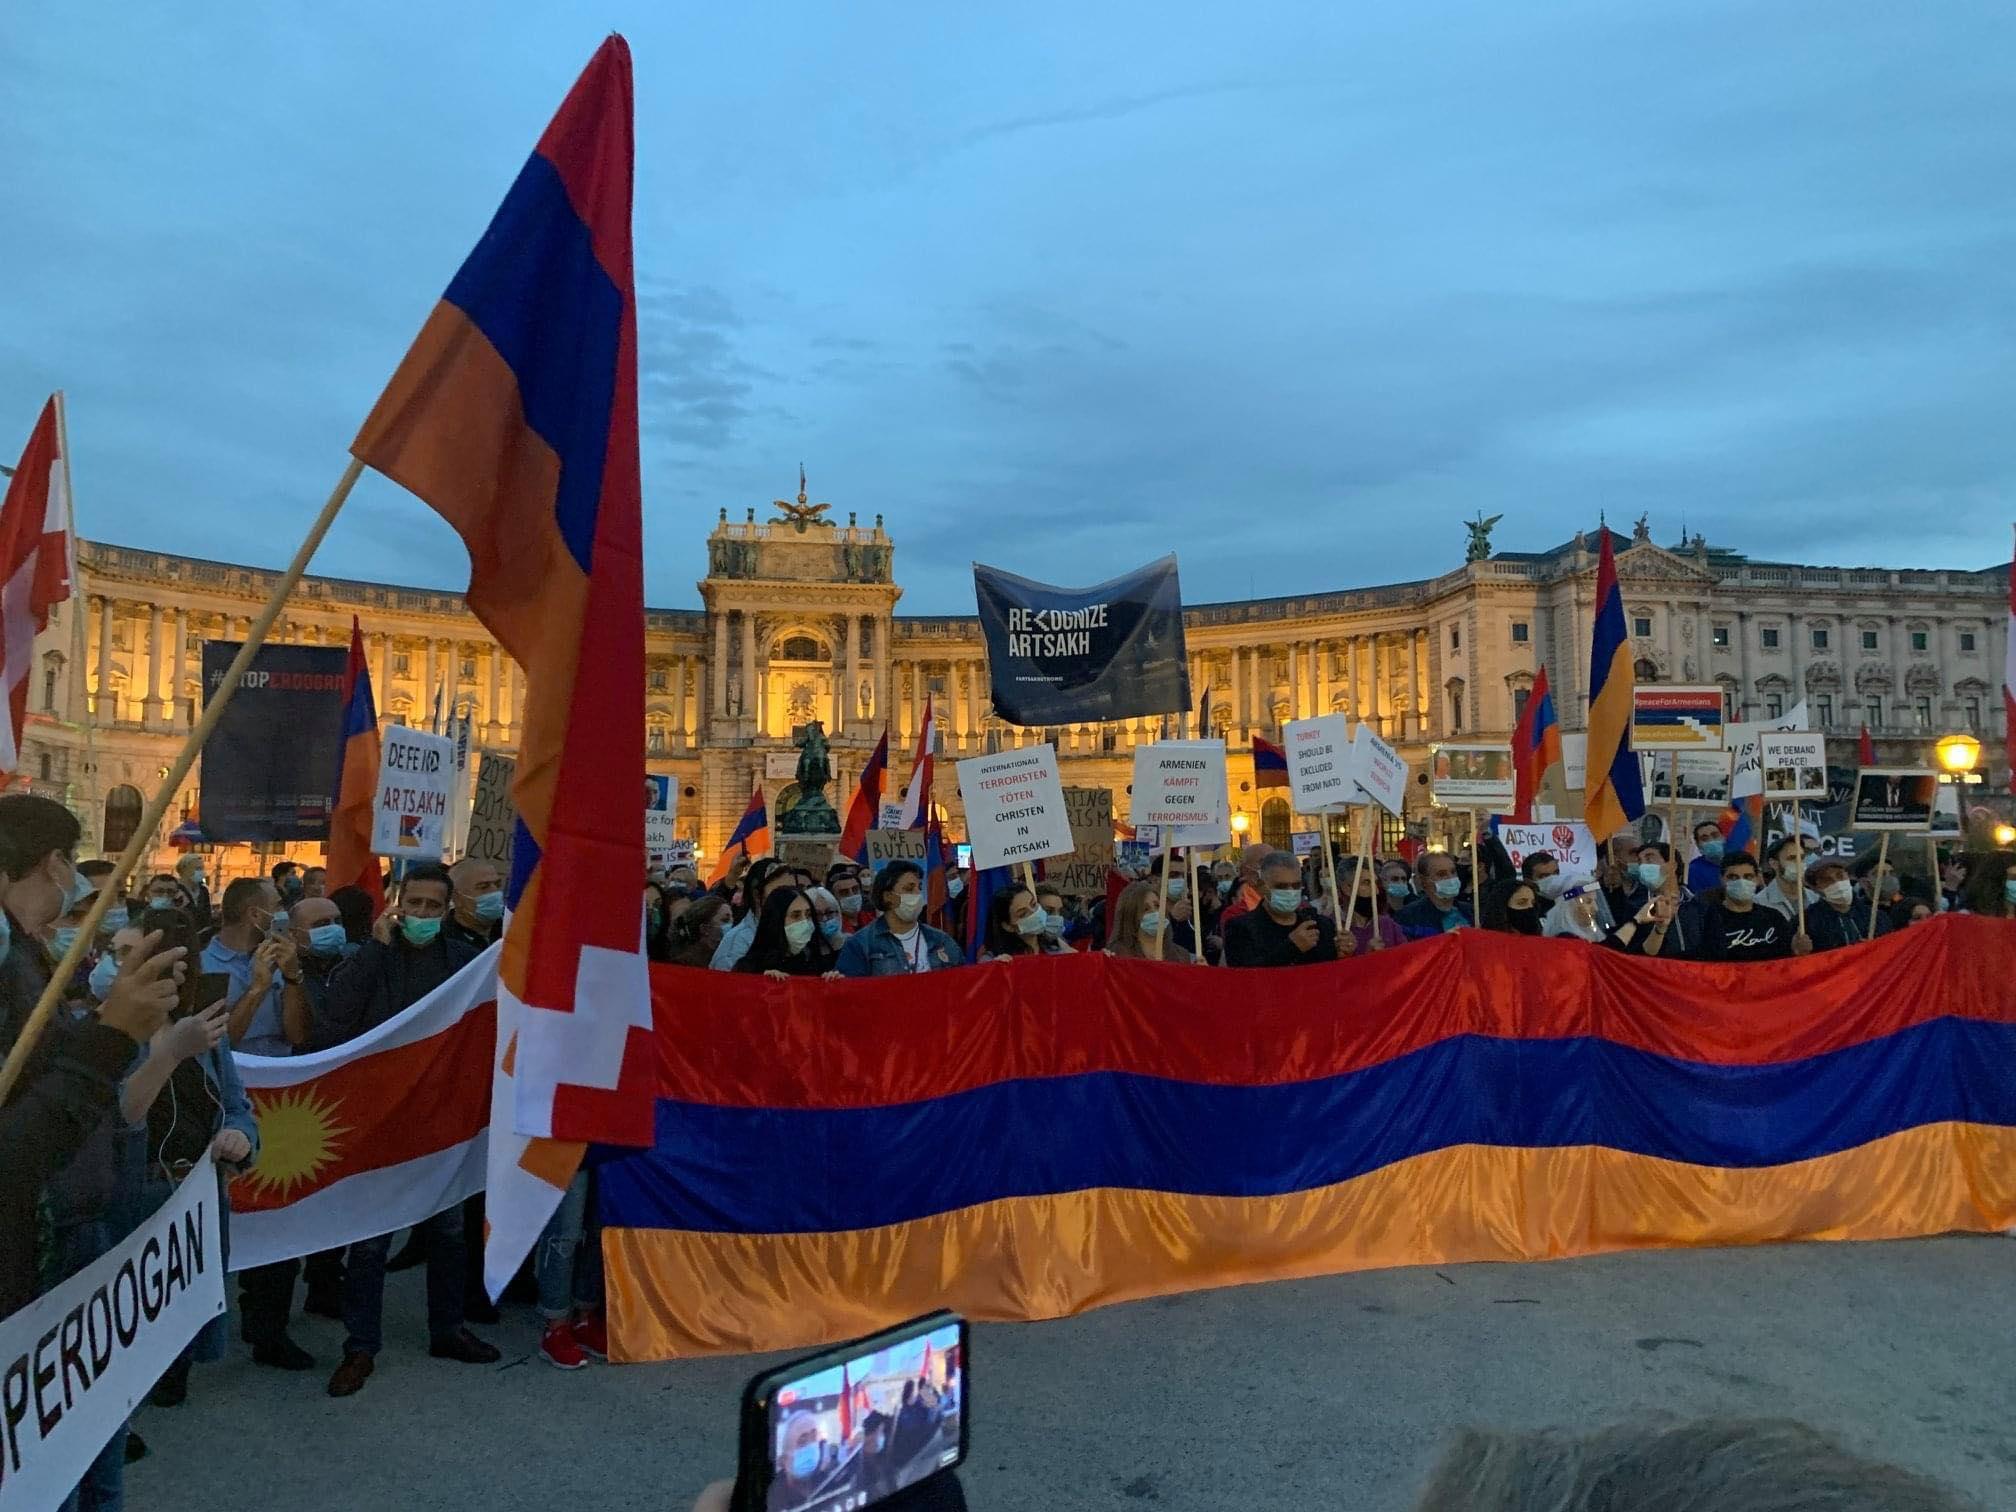 Photo of «Մենք մեր հայրենիքի կողքին ենք». Ավստրիայի հայ համայնքը բազմամարդ հանրահավաք է կազմակերպել